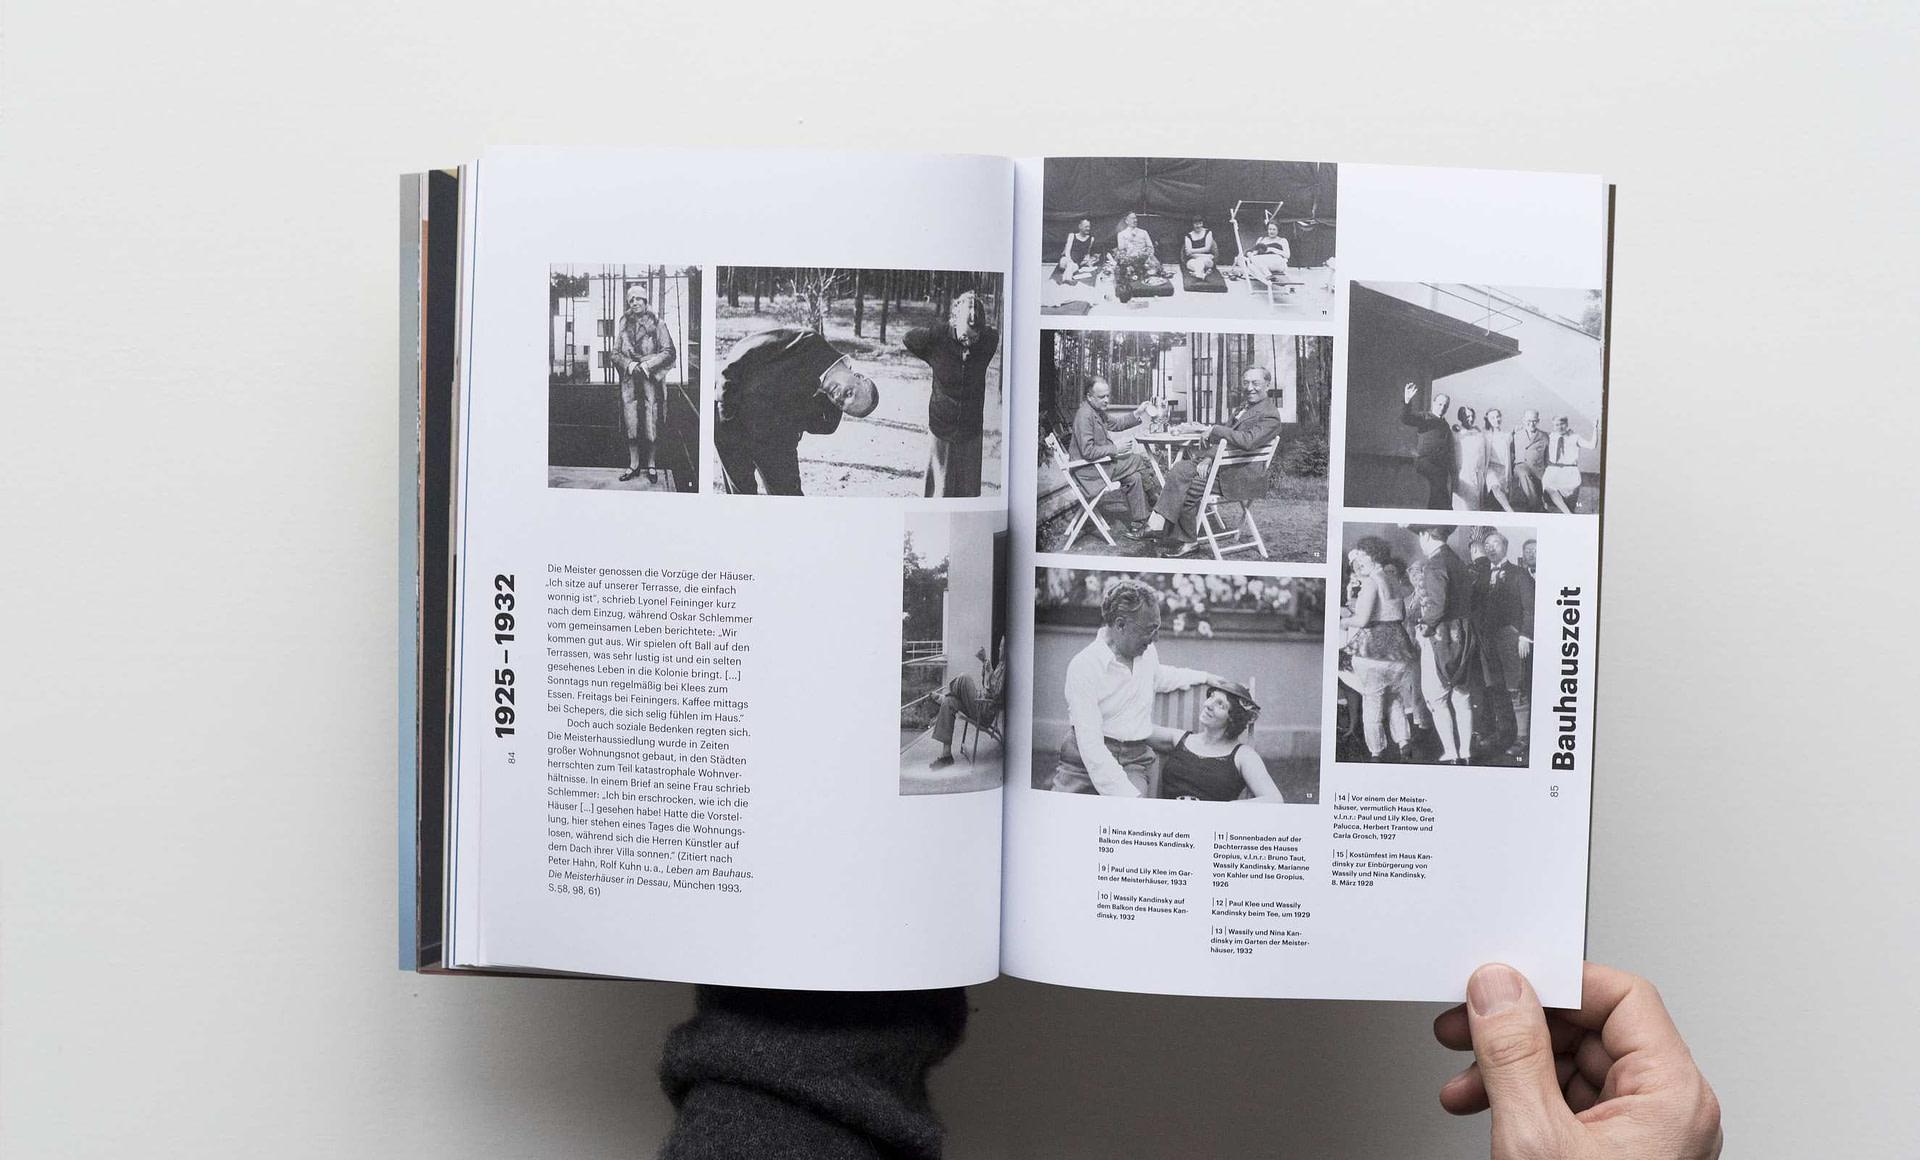 meisterhaus-kandinsky-klee-book-12-2650x1600px